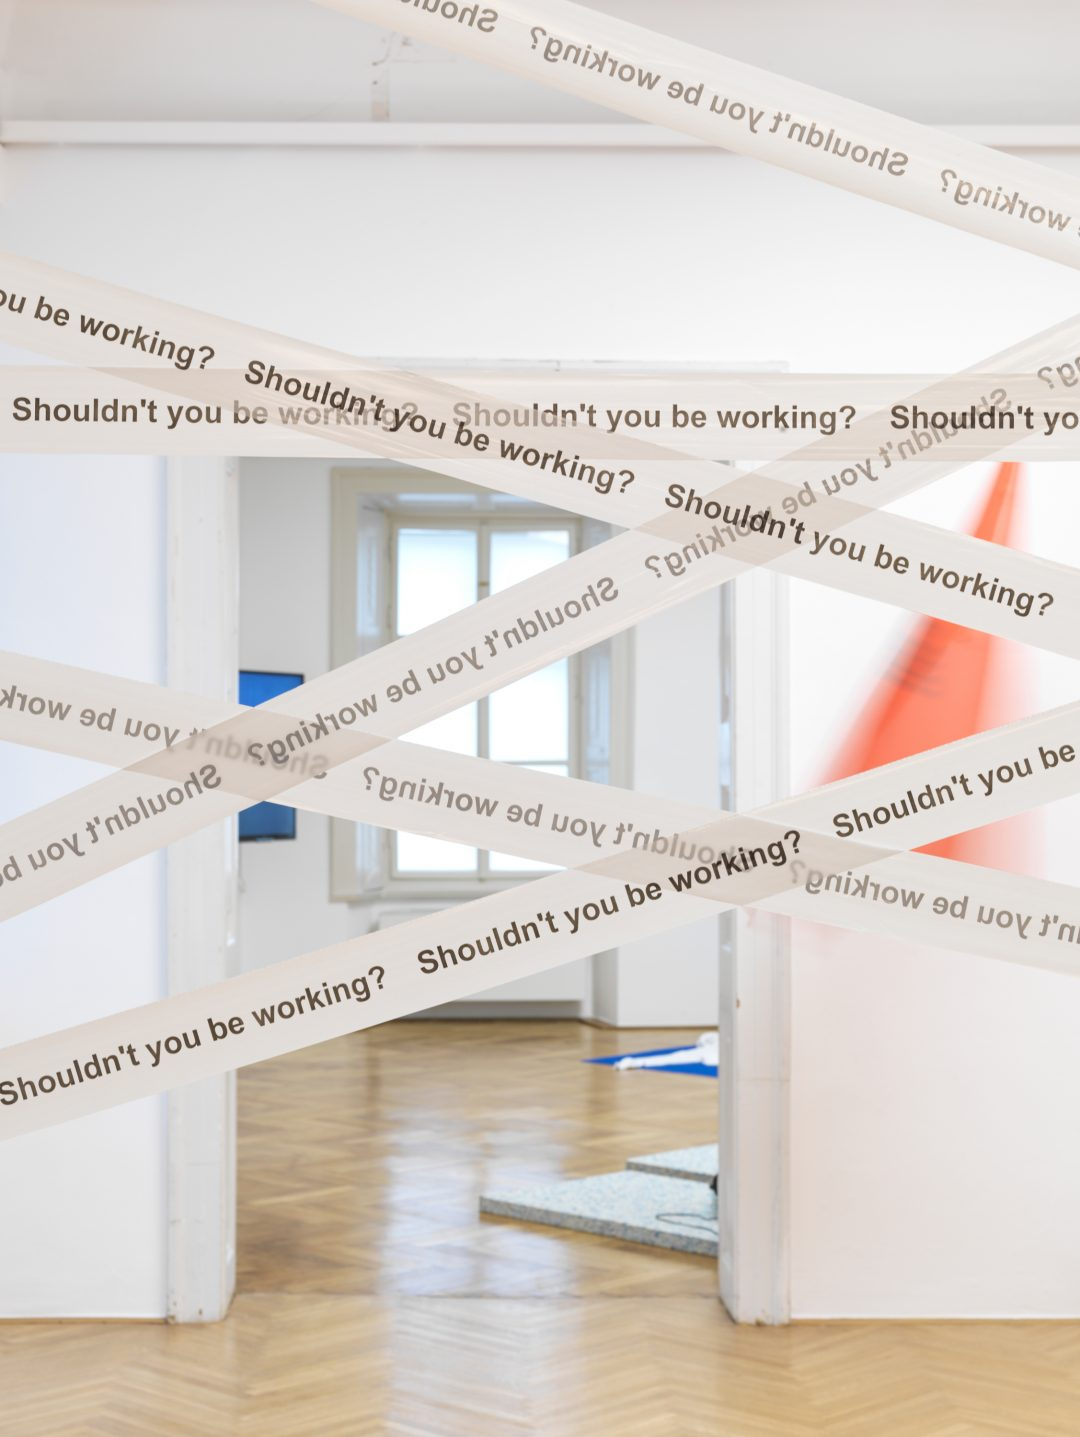 Shou;dn't You Be Working? Silvio Lorusso at Aksioma / MGLC.